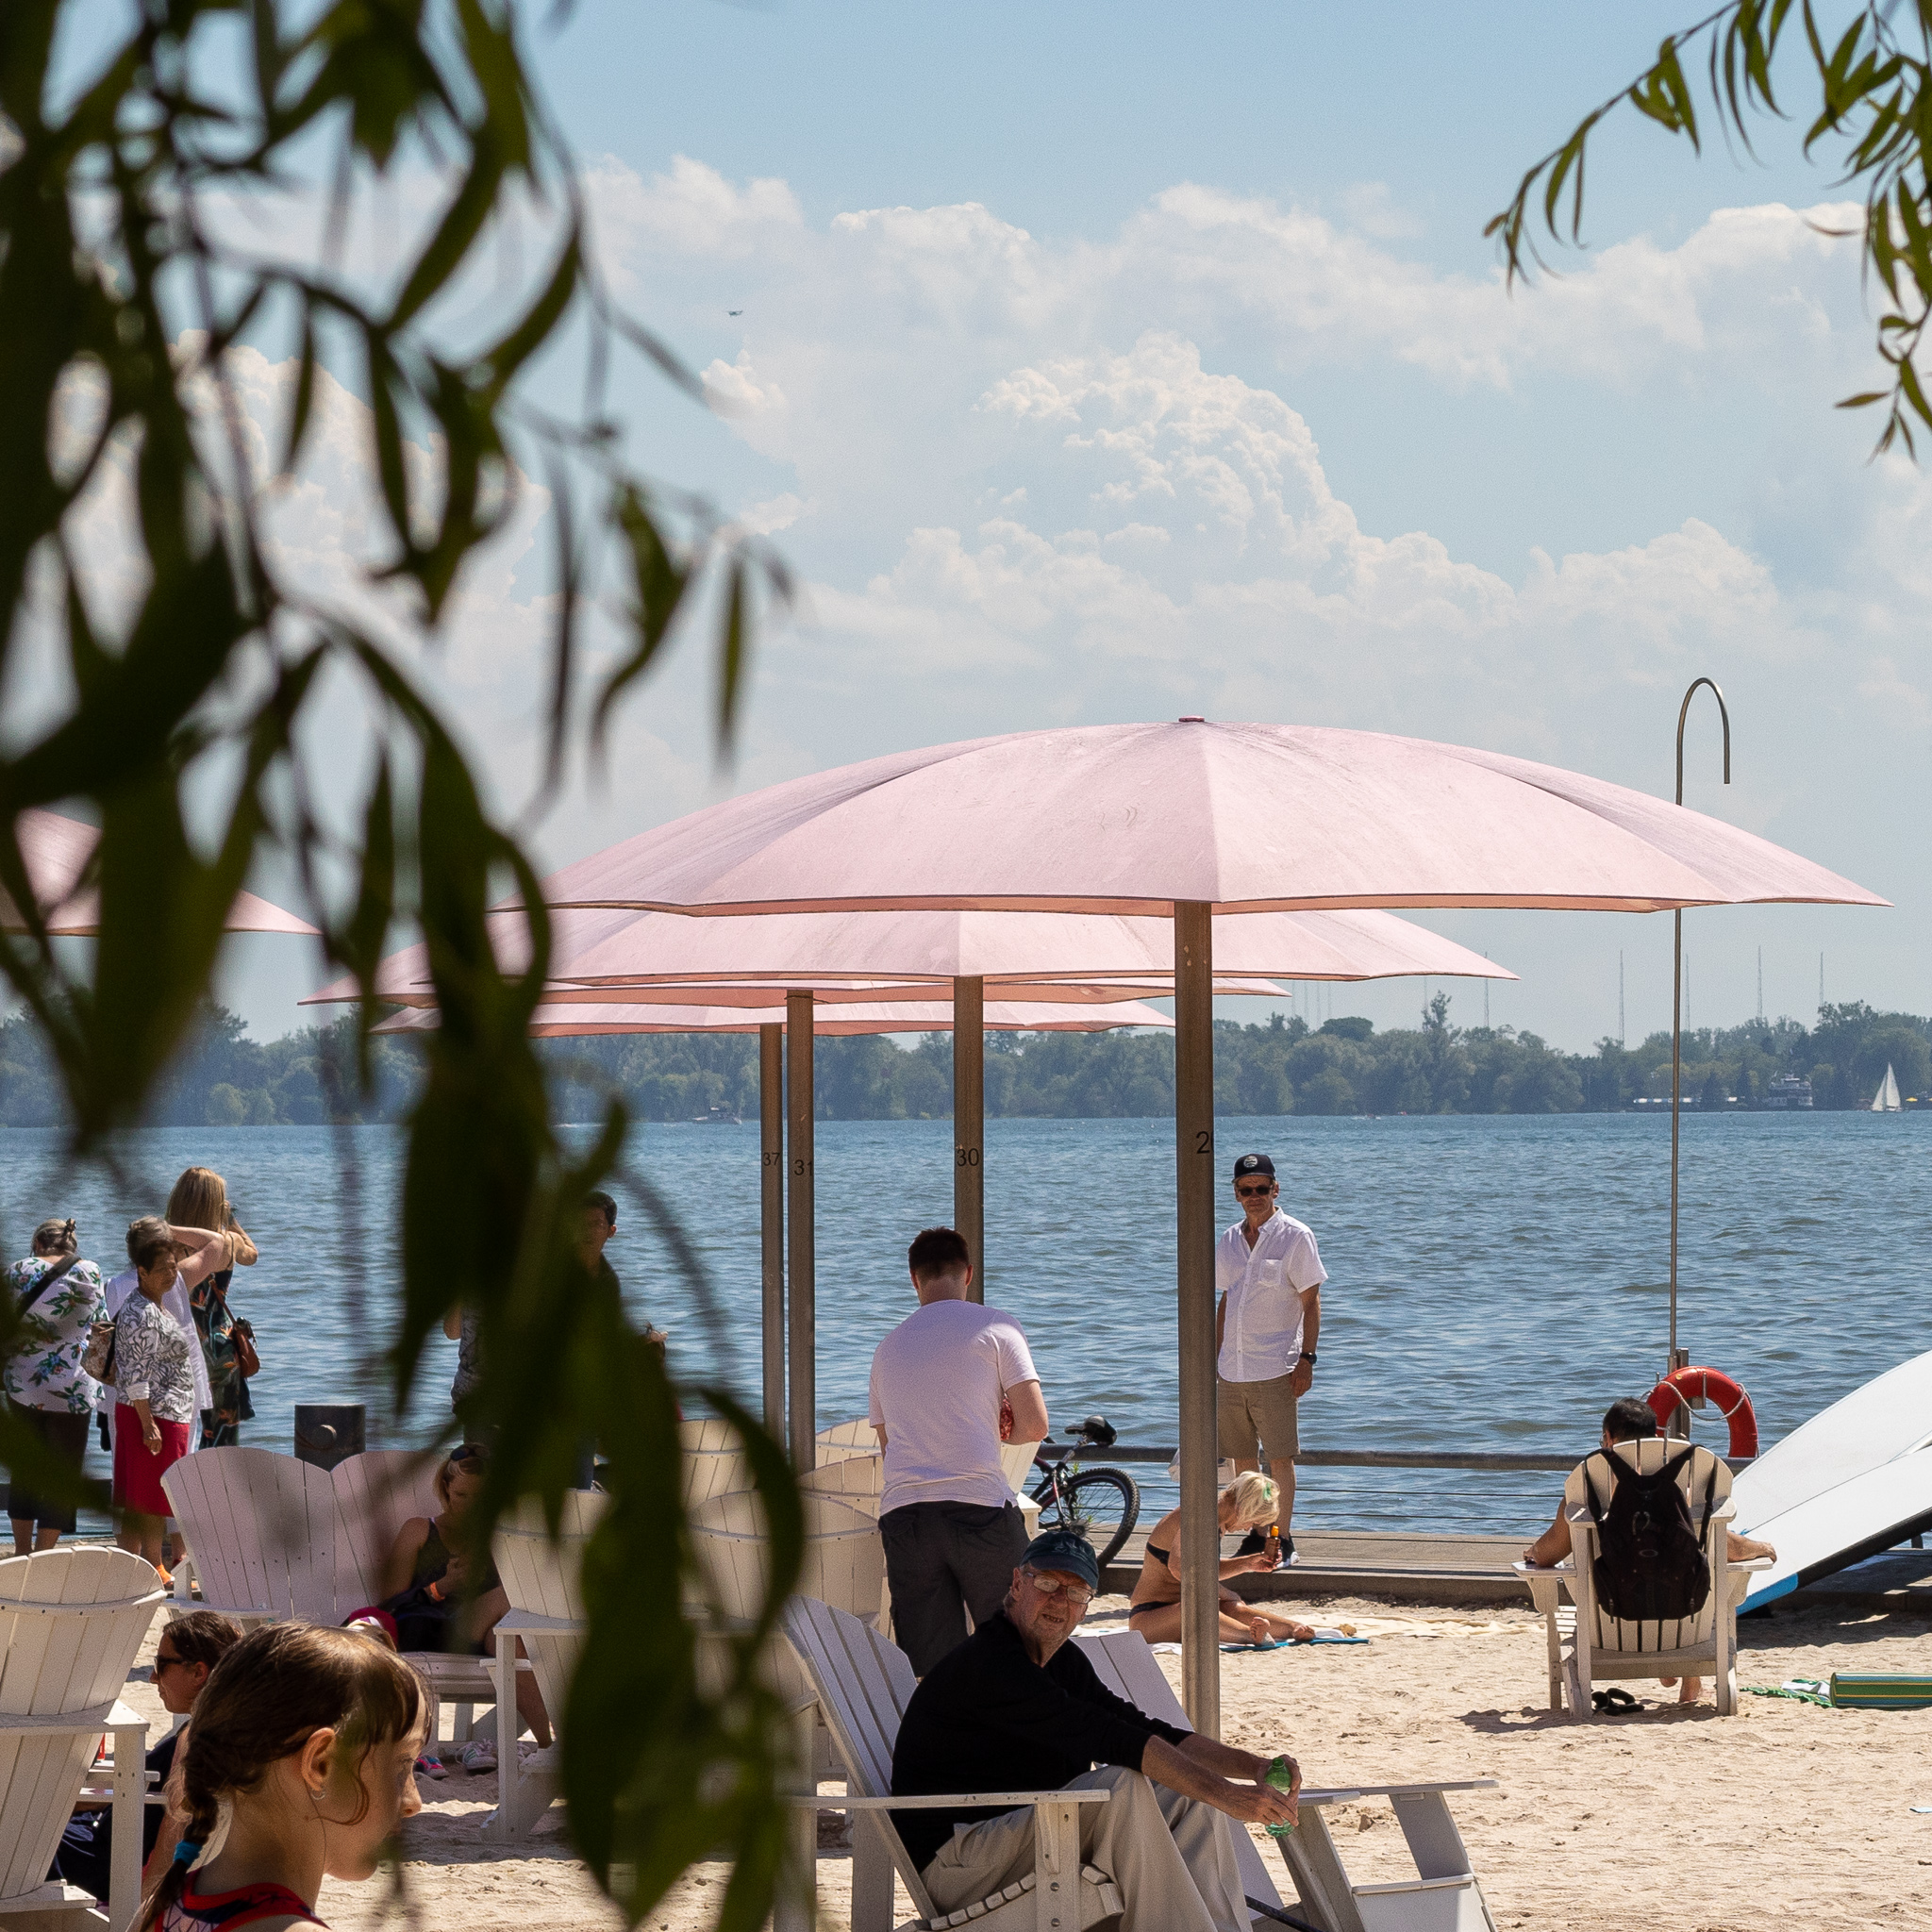 Pink parasols in Sugar Beach Park.